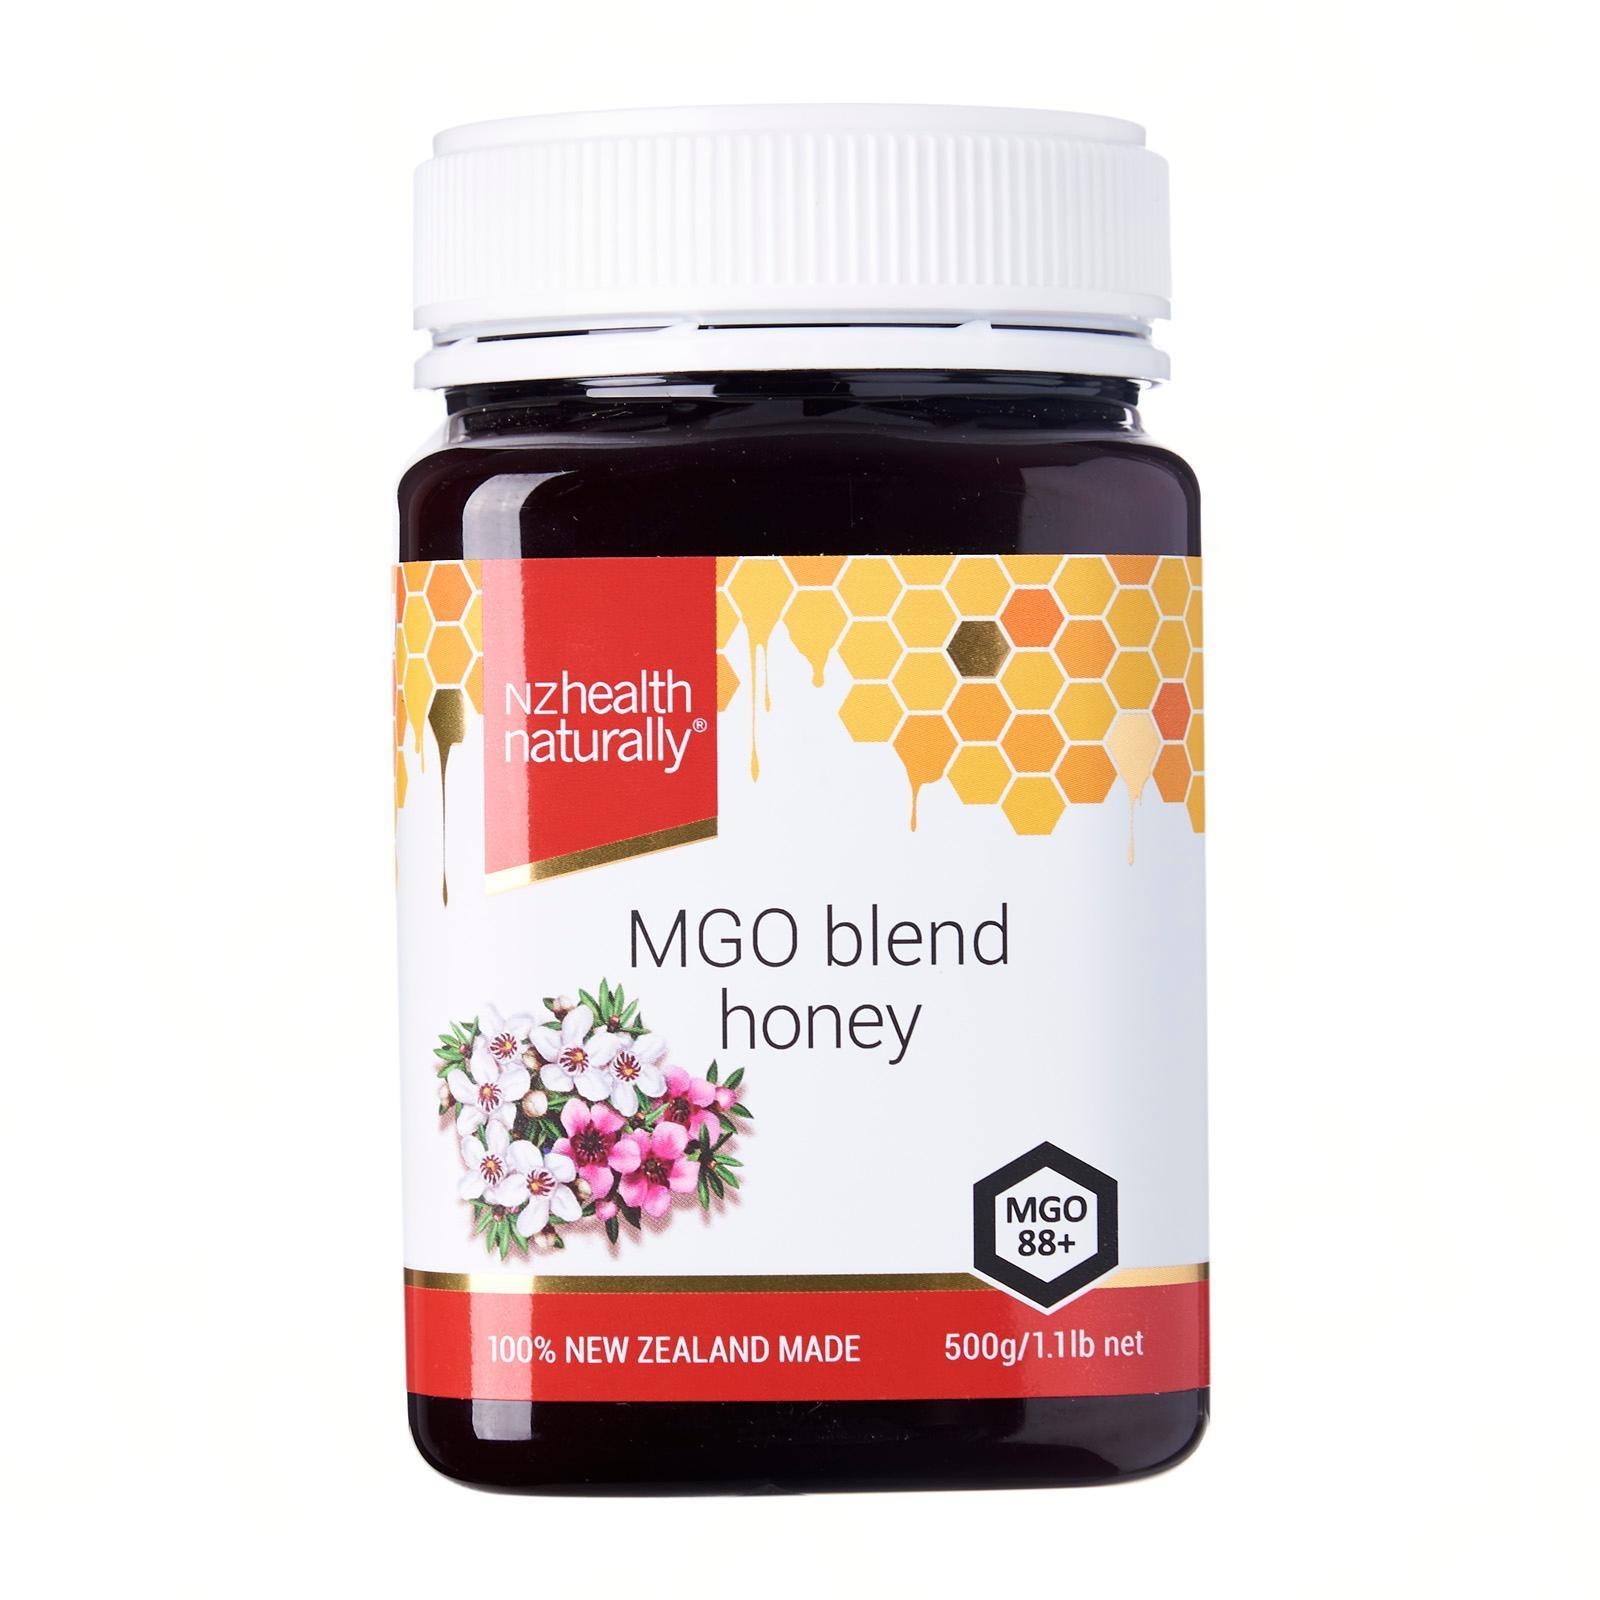 NZ Health Naturally MGO Blend Honey MGO 88+